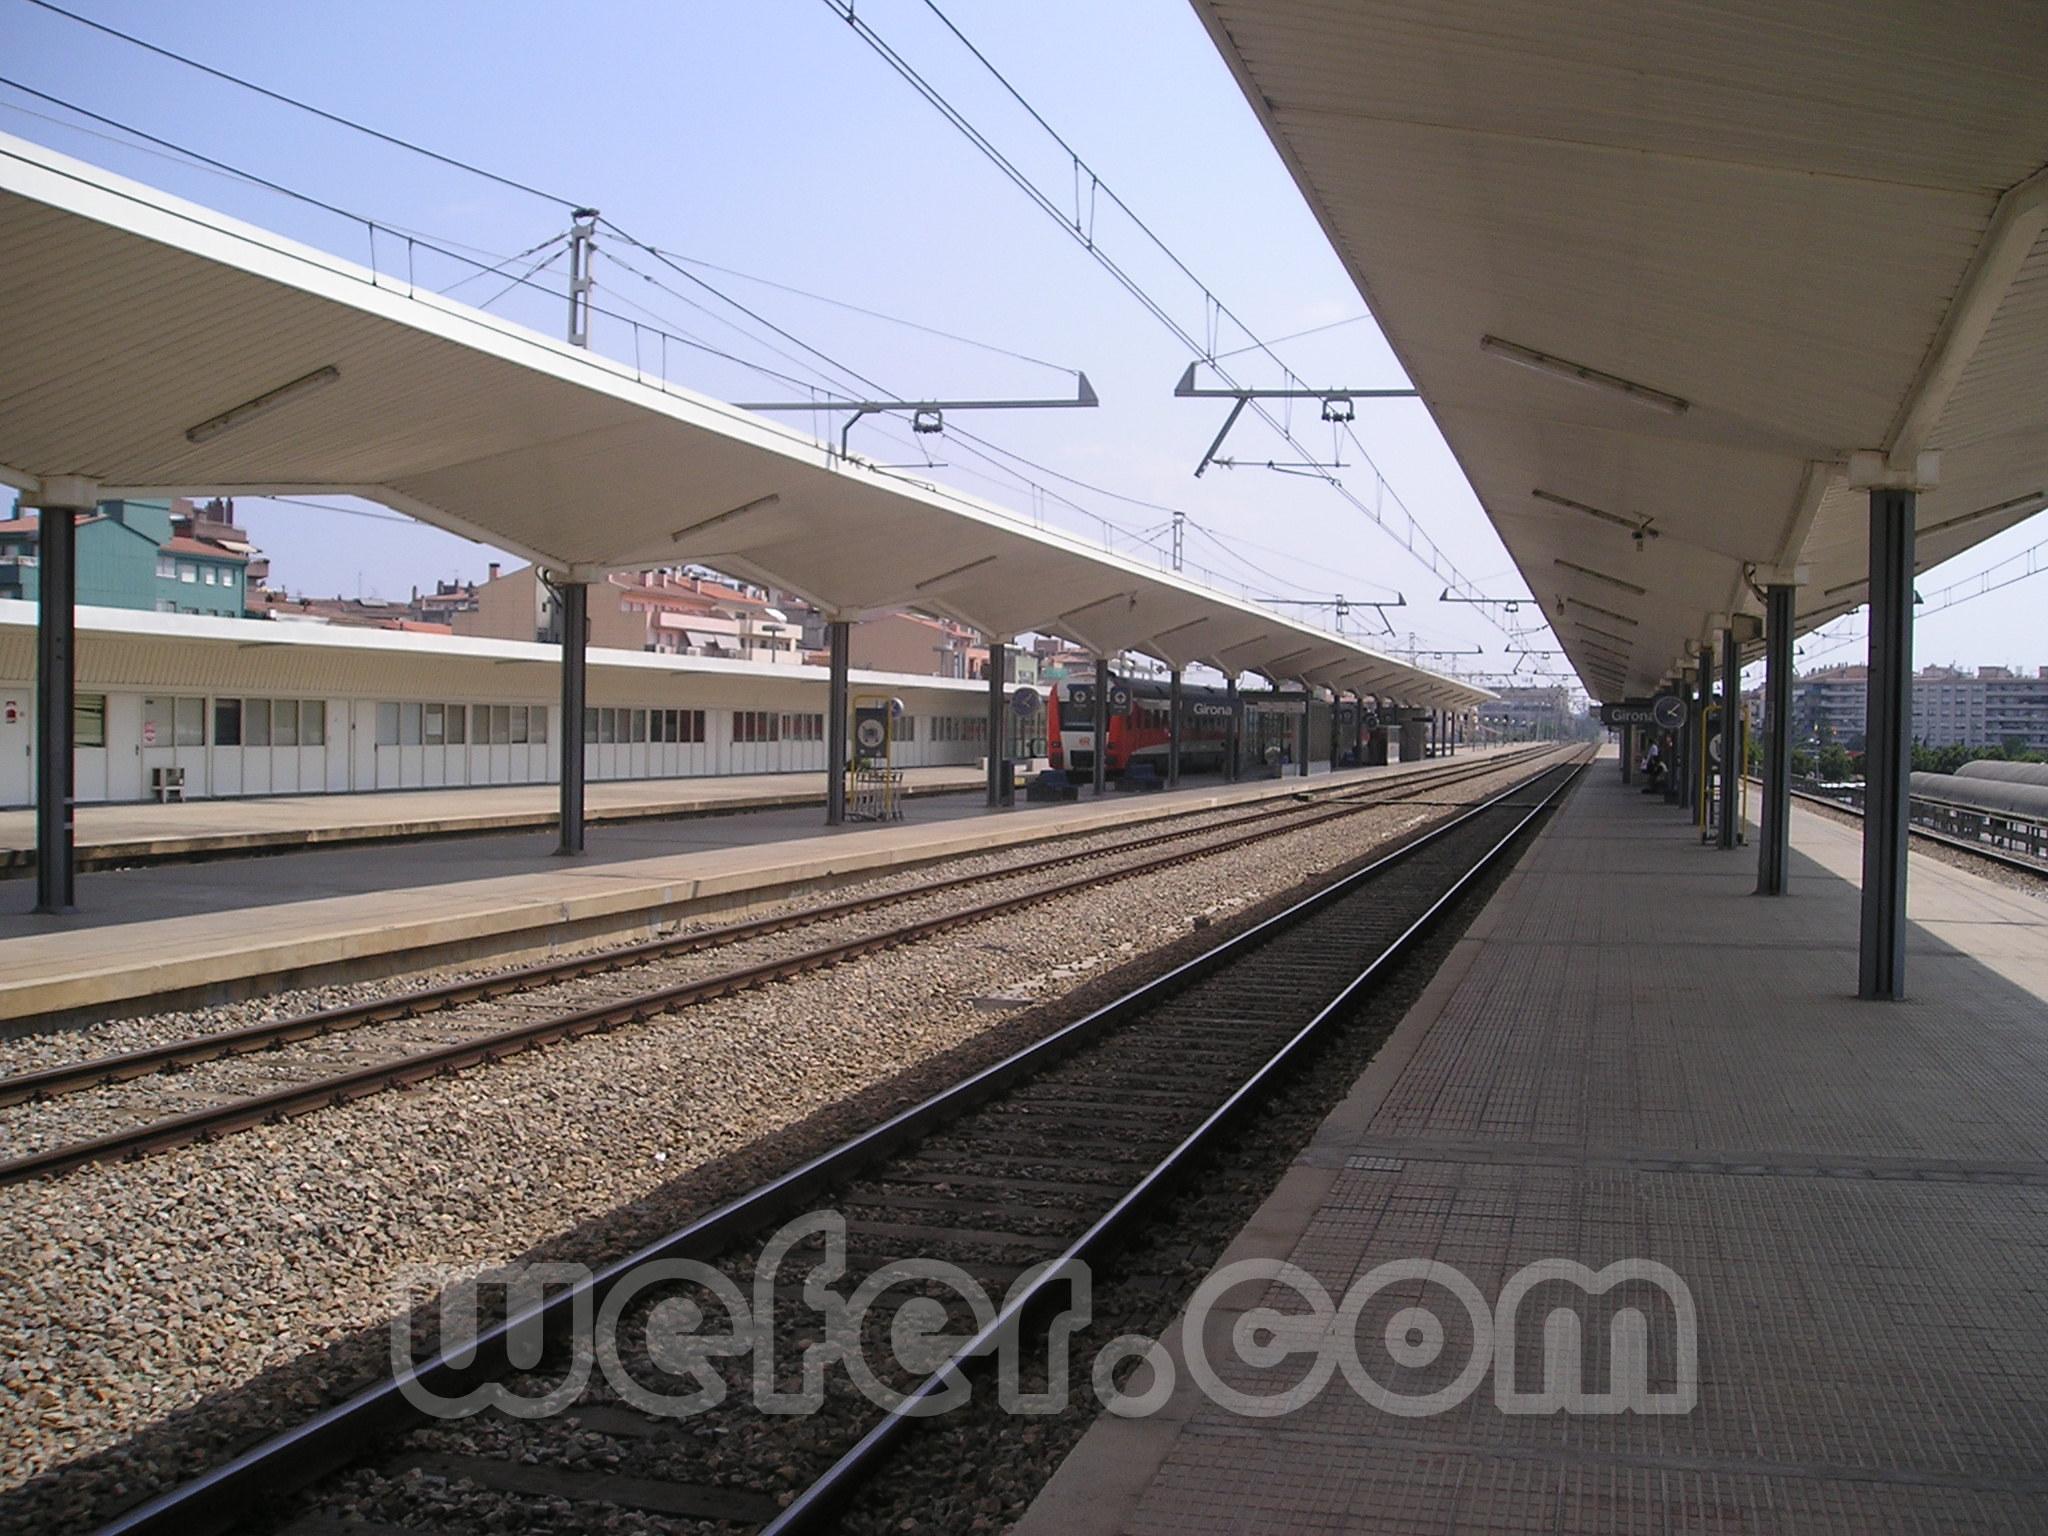 Renfe / ADIF: Girona